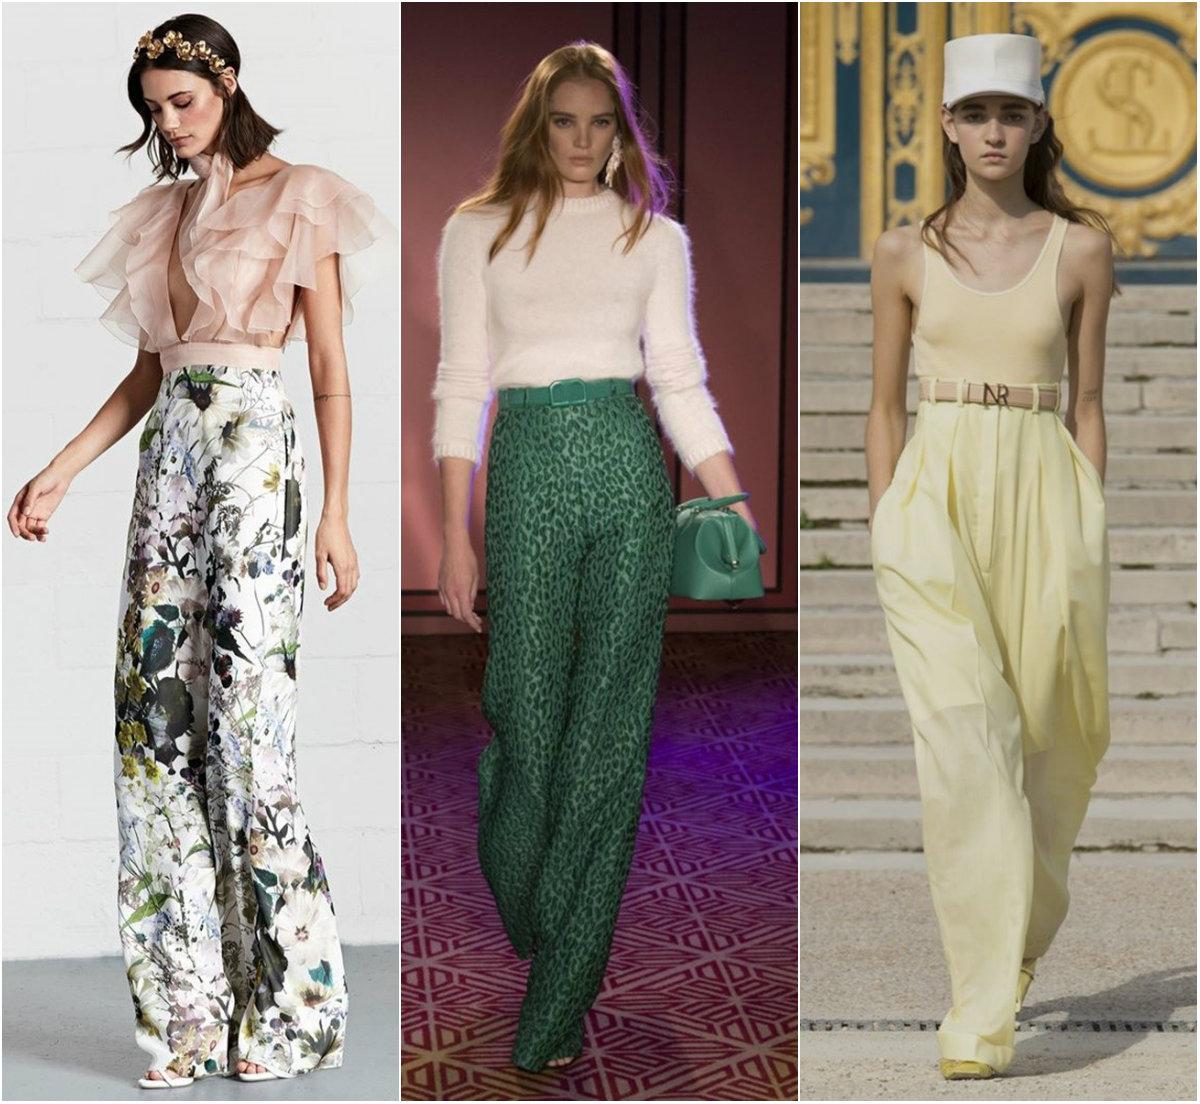 брюки женские 2019: брюки палаццо